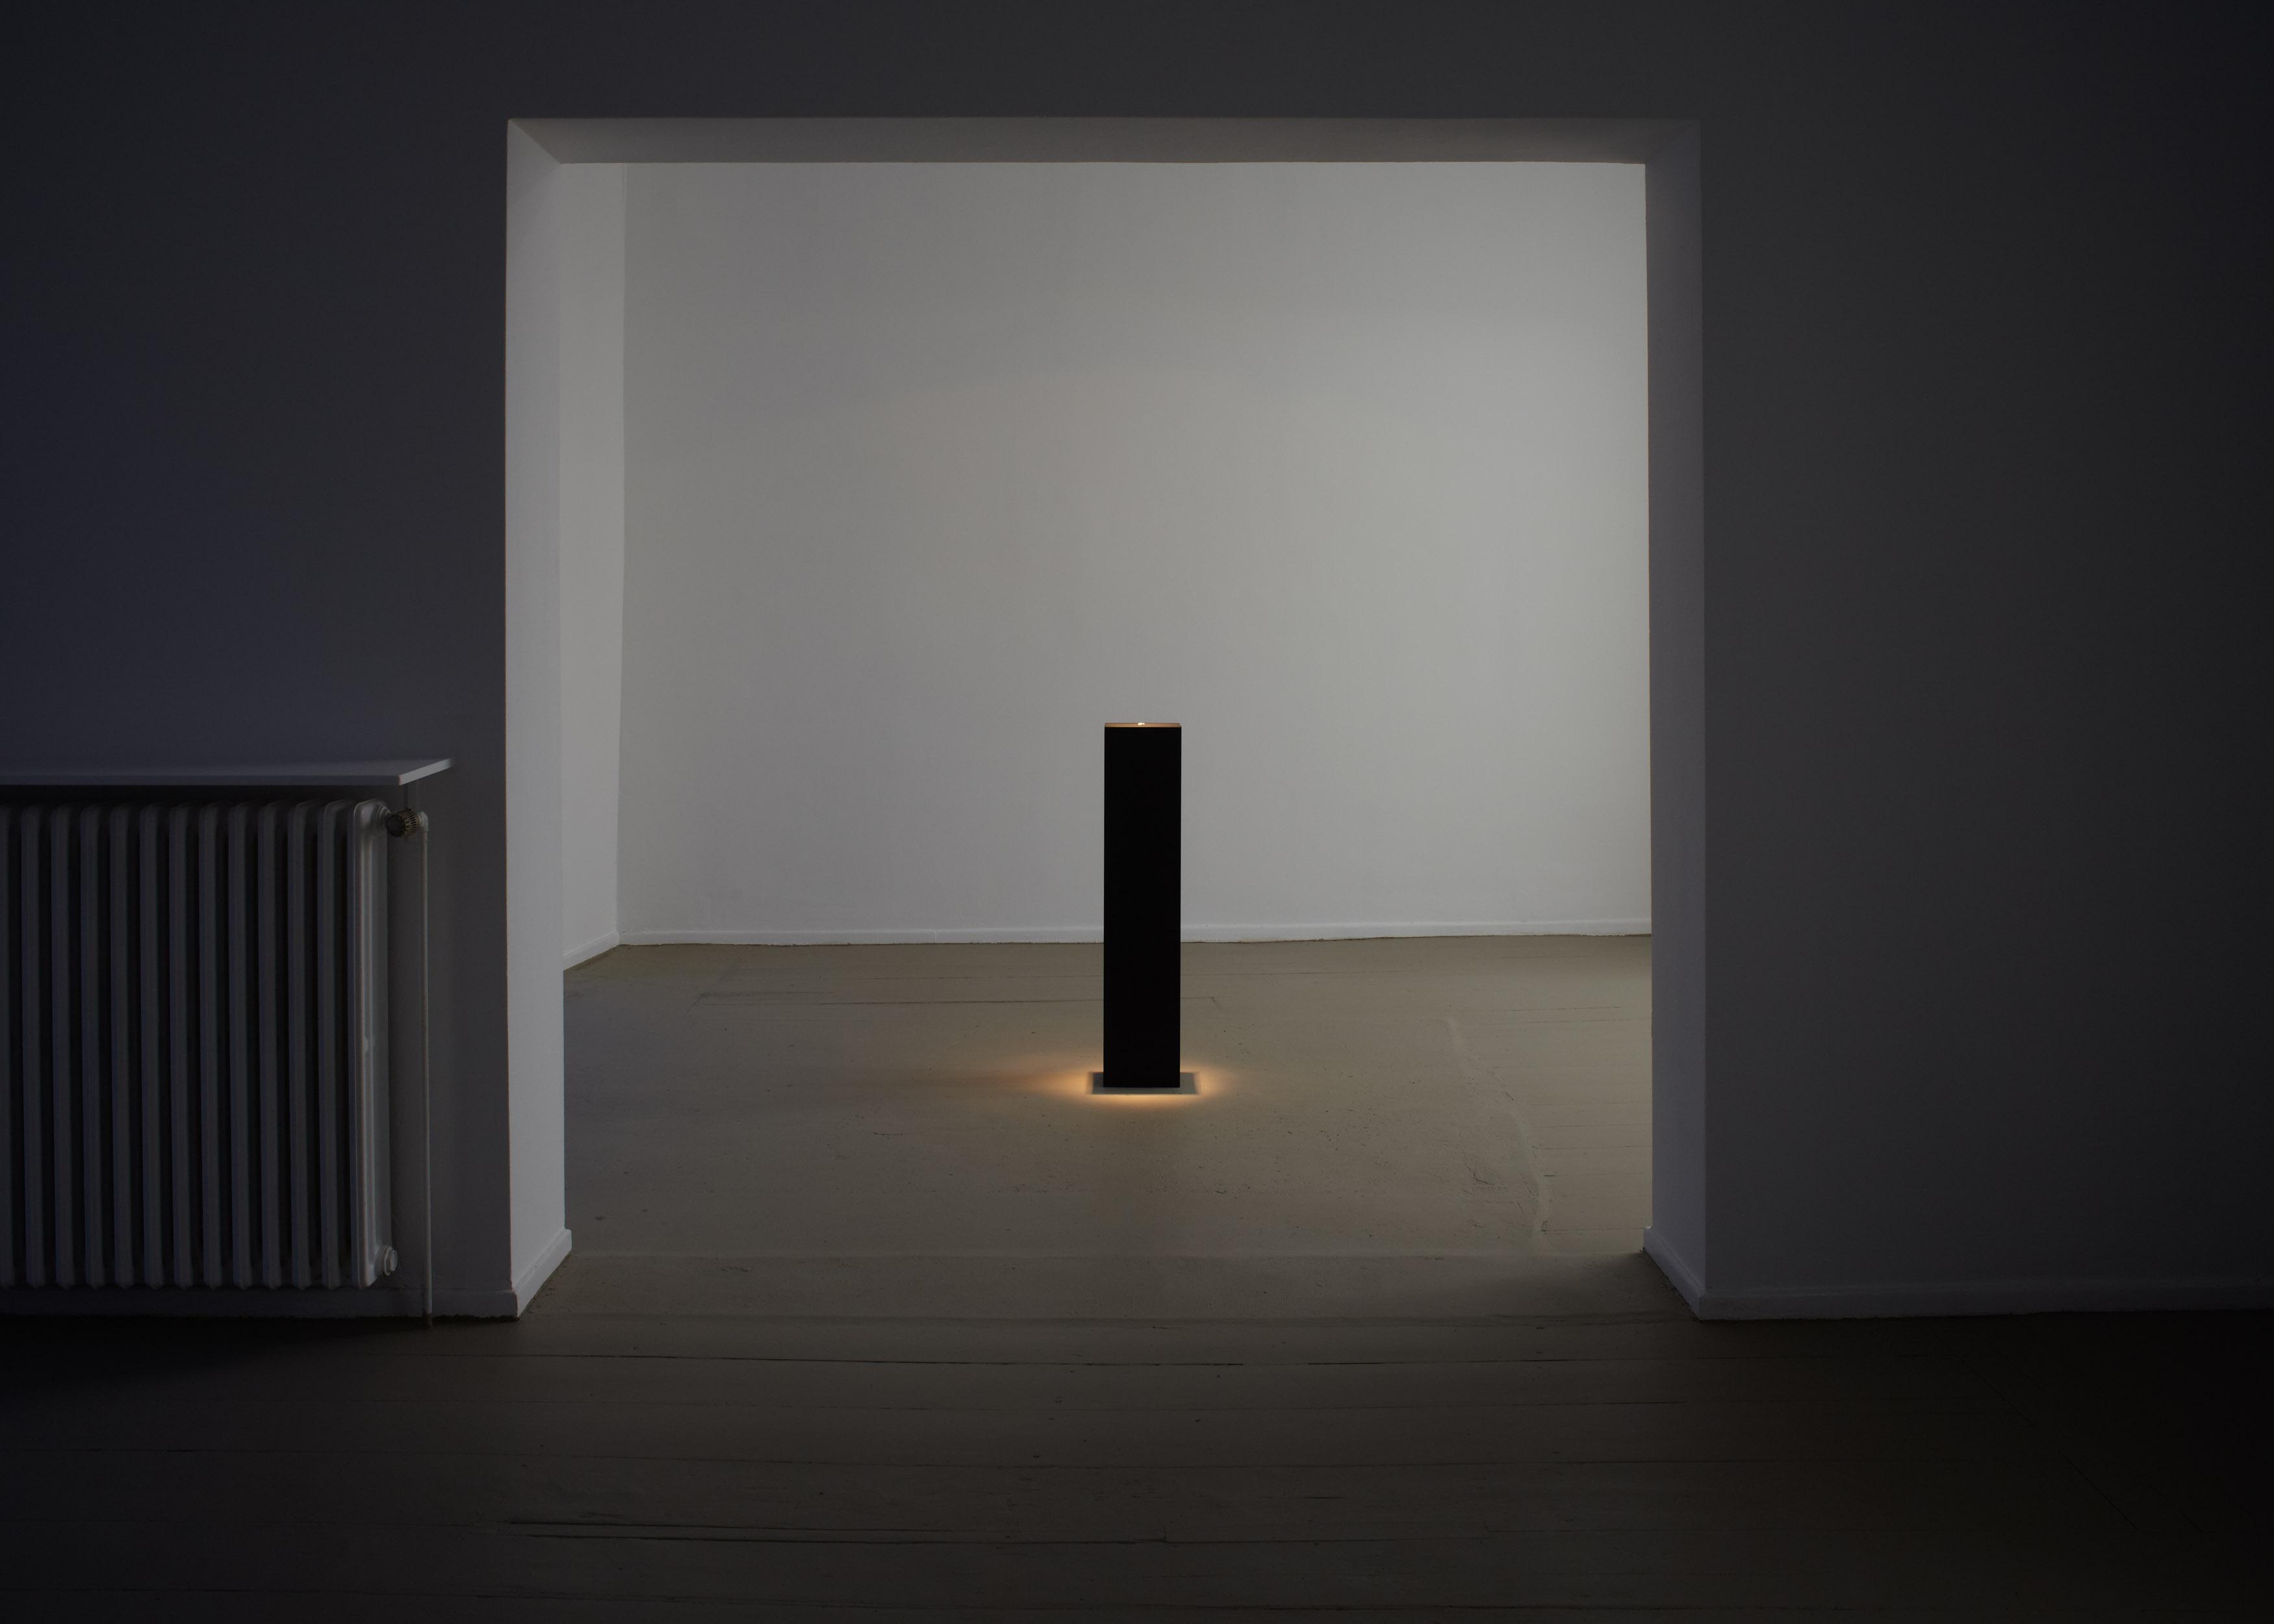 Ulf Aminde - the weight, 2013